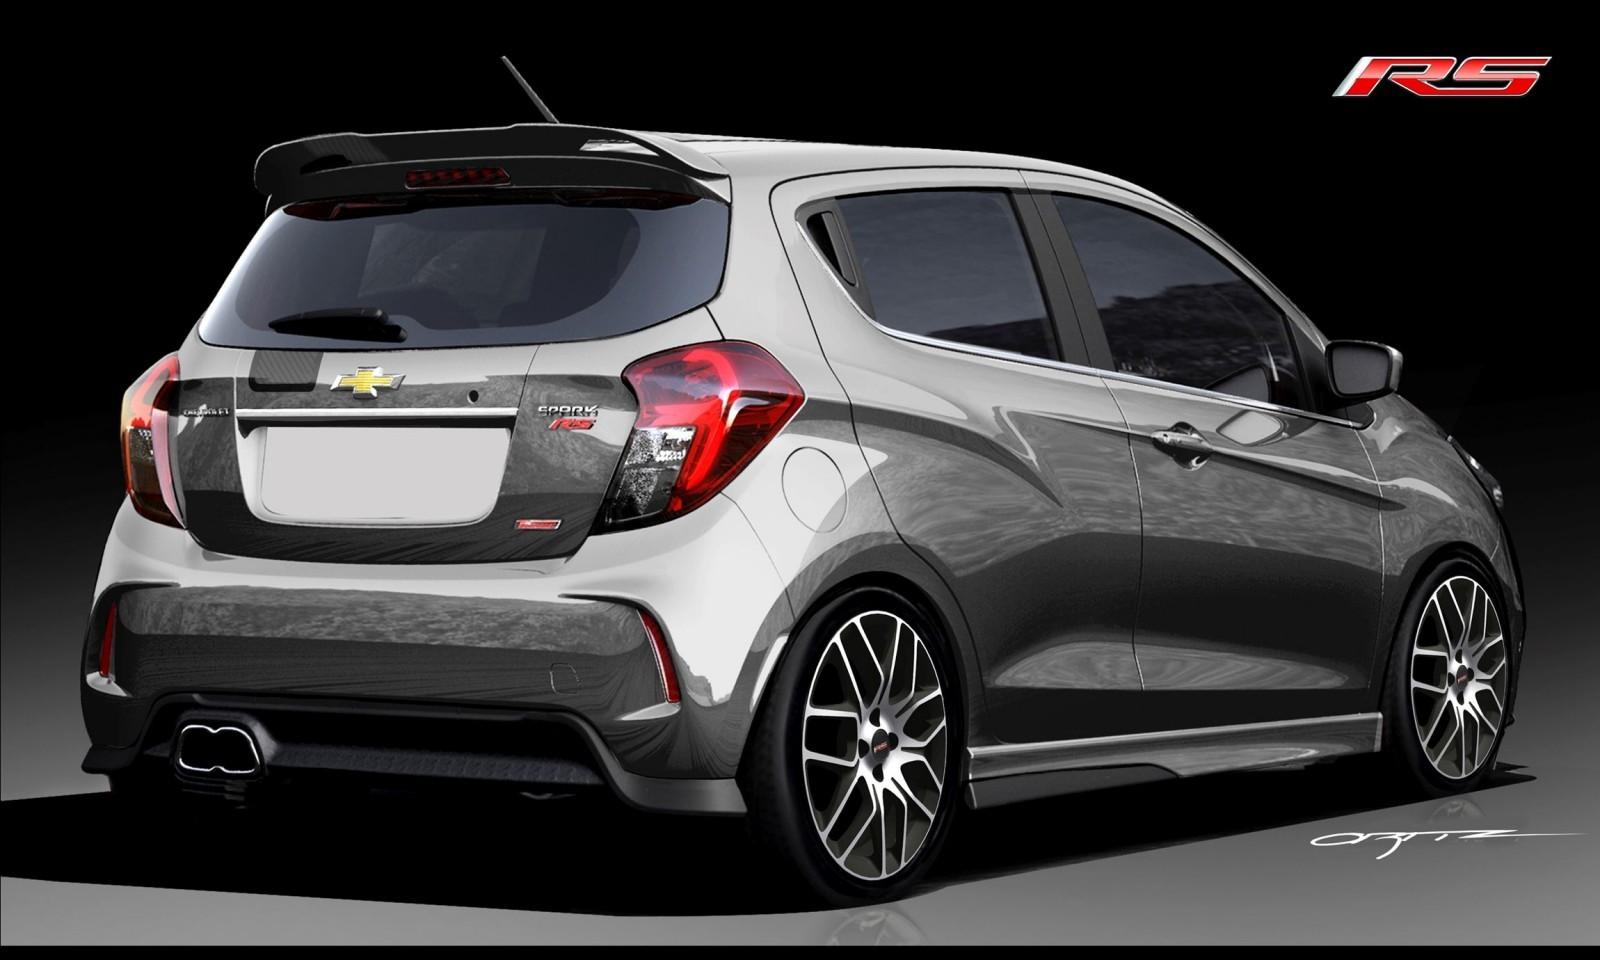 Chevrolet 2015 Sema Red Line Concepts